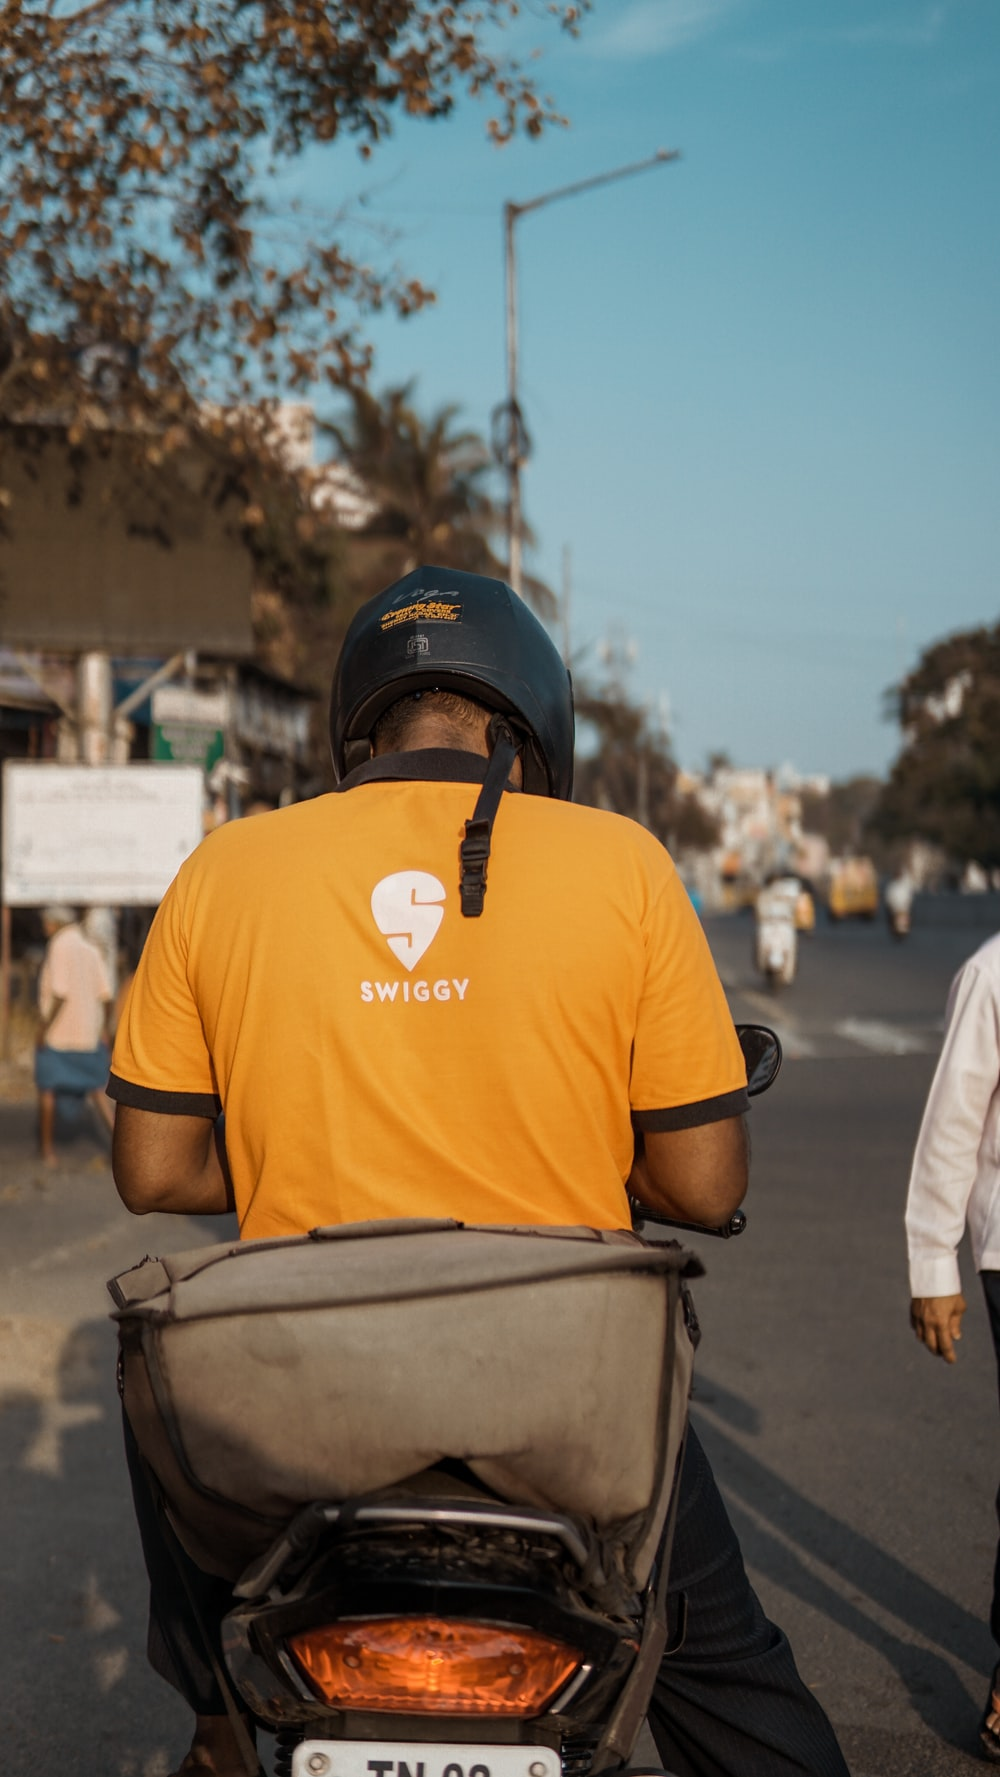 man in orange crew neck t-shirt wearing black helmet